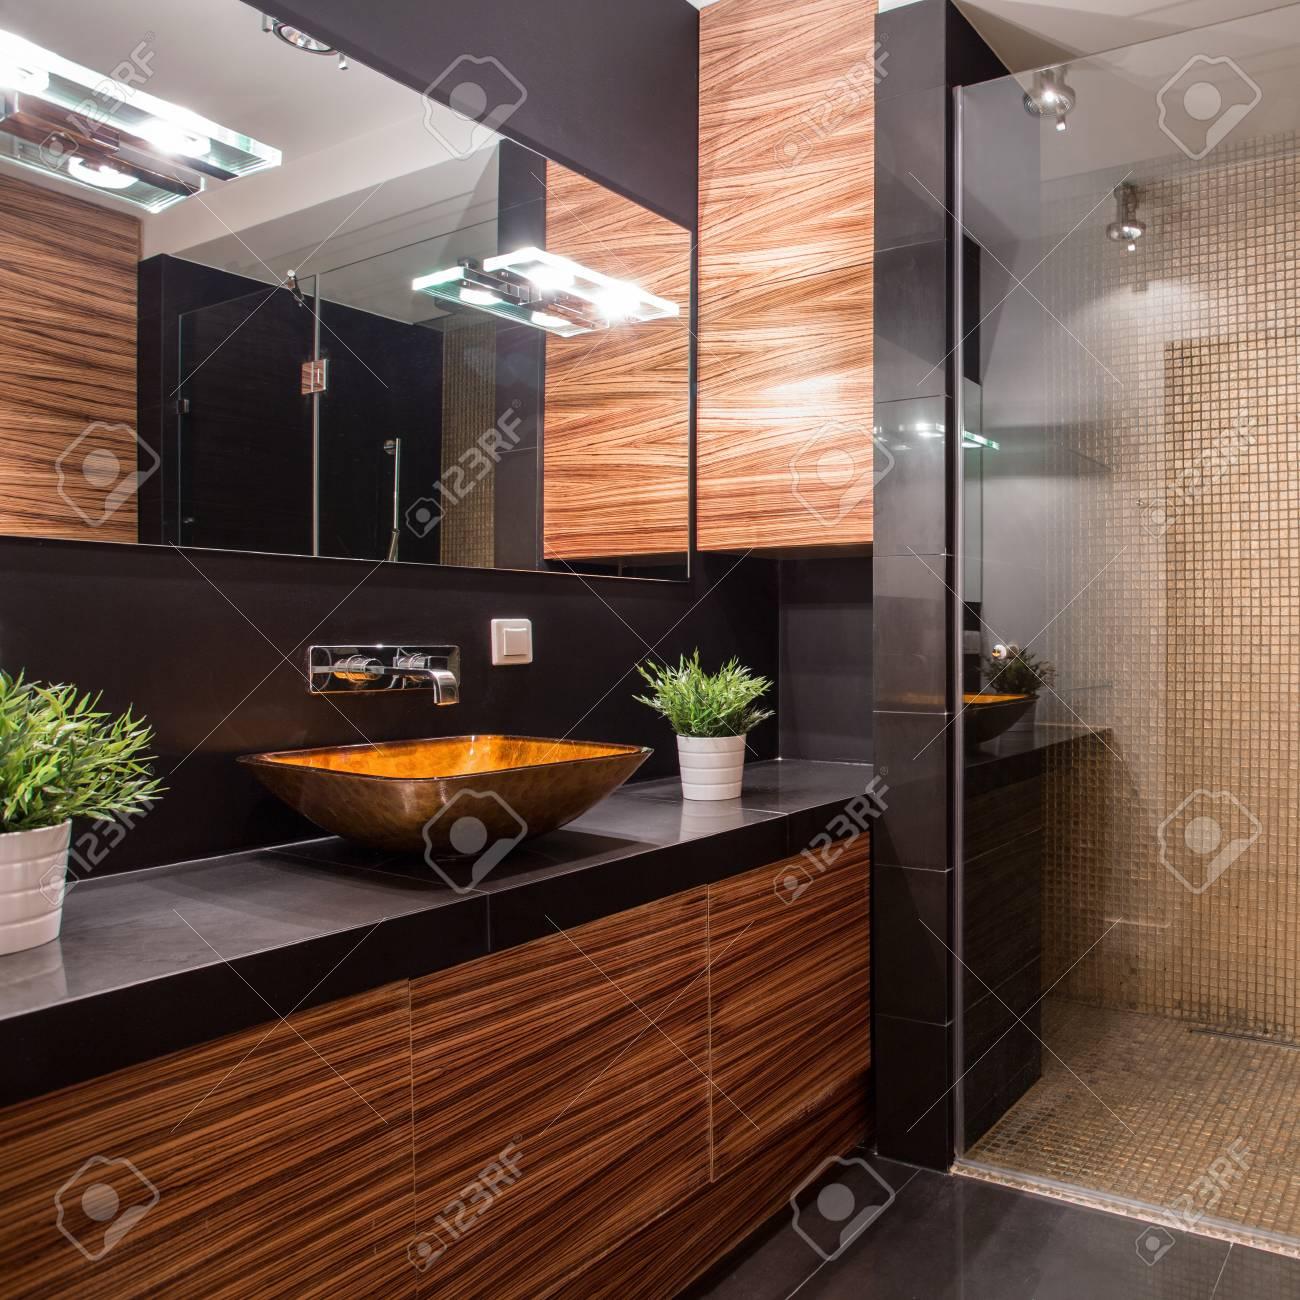 Full Size of Dusche Wand Wandbelag Küche Schlafzimmer Wandtattoo Sprüche Fliesen Siphon Begehbare Ohne Tür Barrierefreie Bluetooth Lautsprecher Regal Rückwand Glaswand Dusche Dusche Wand